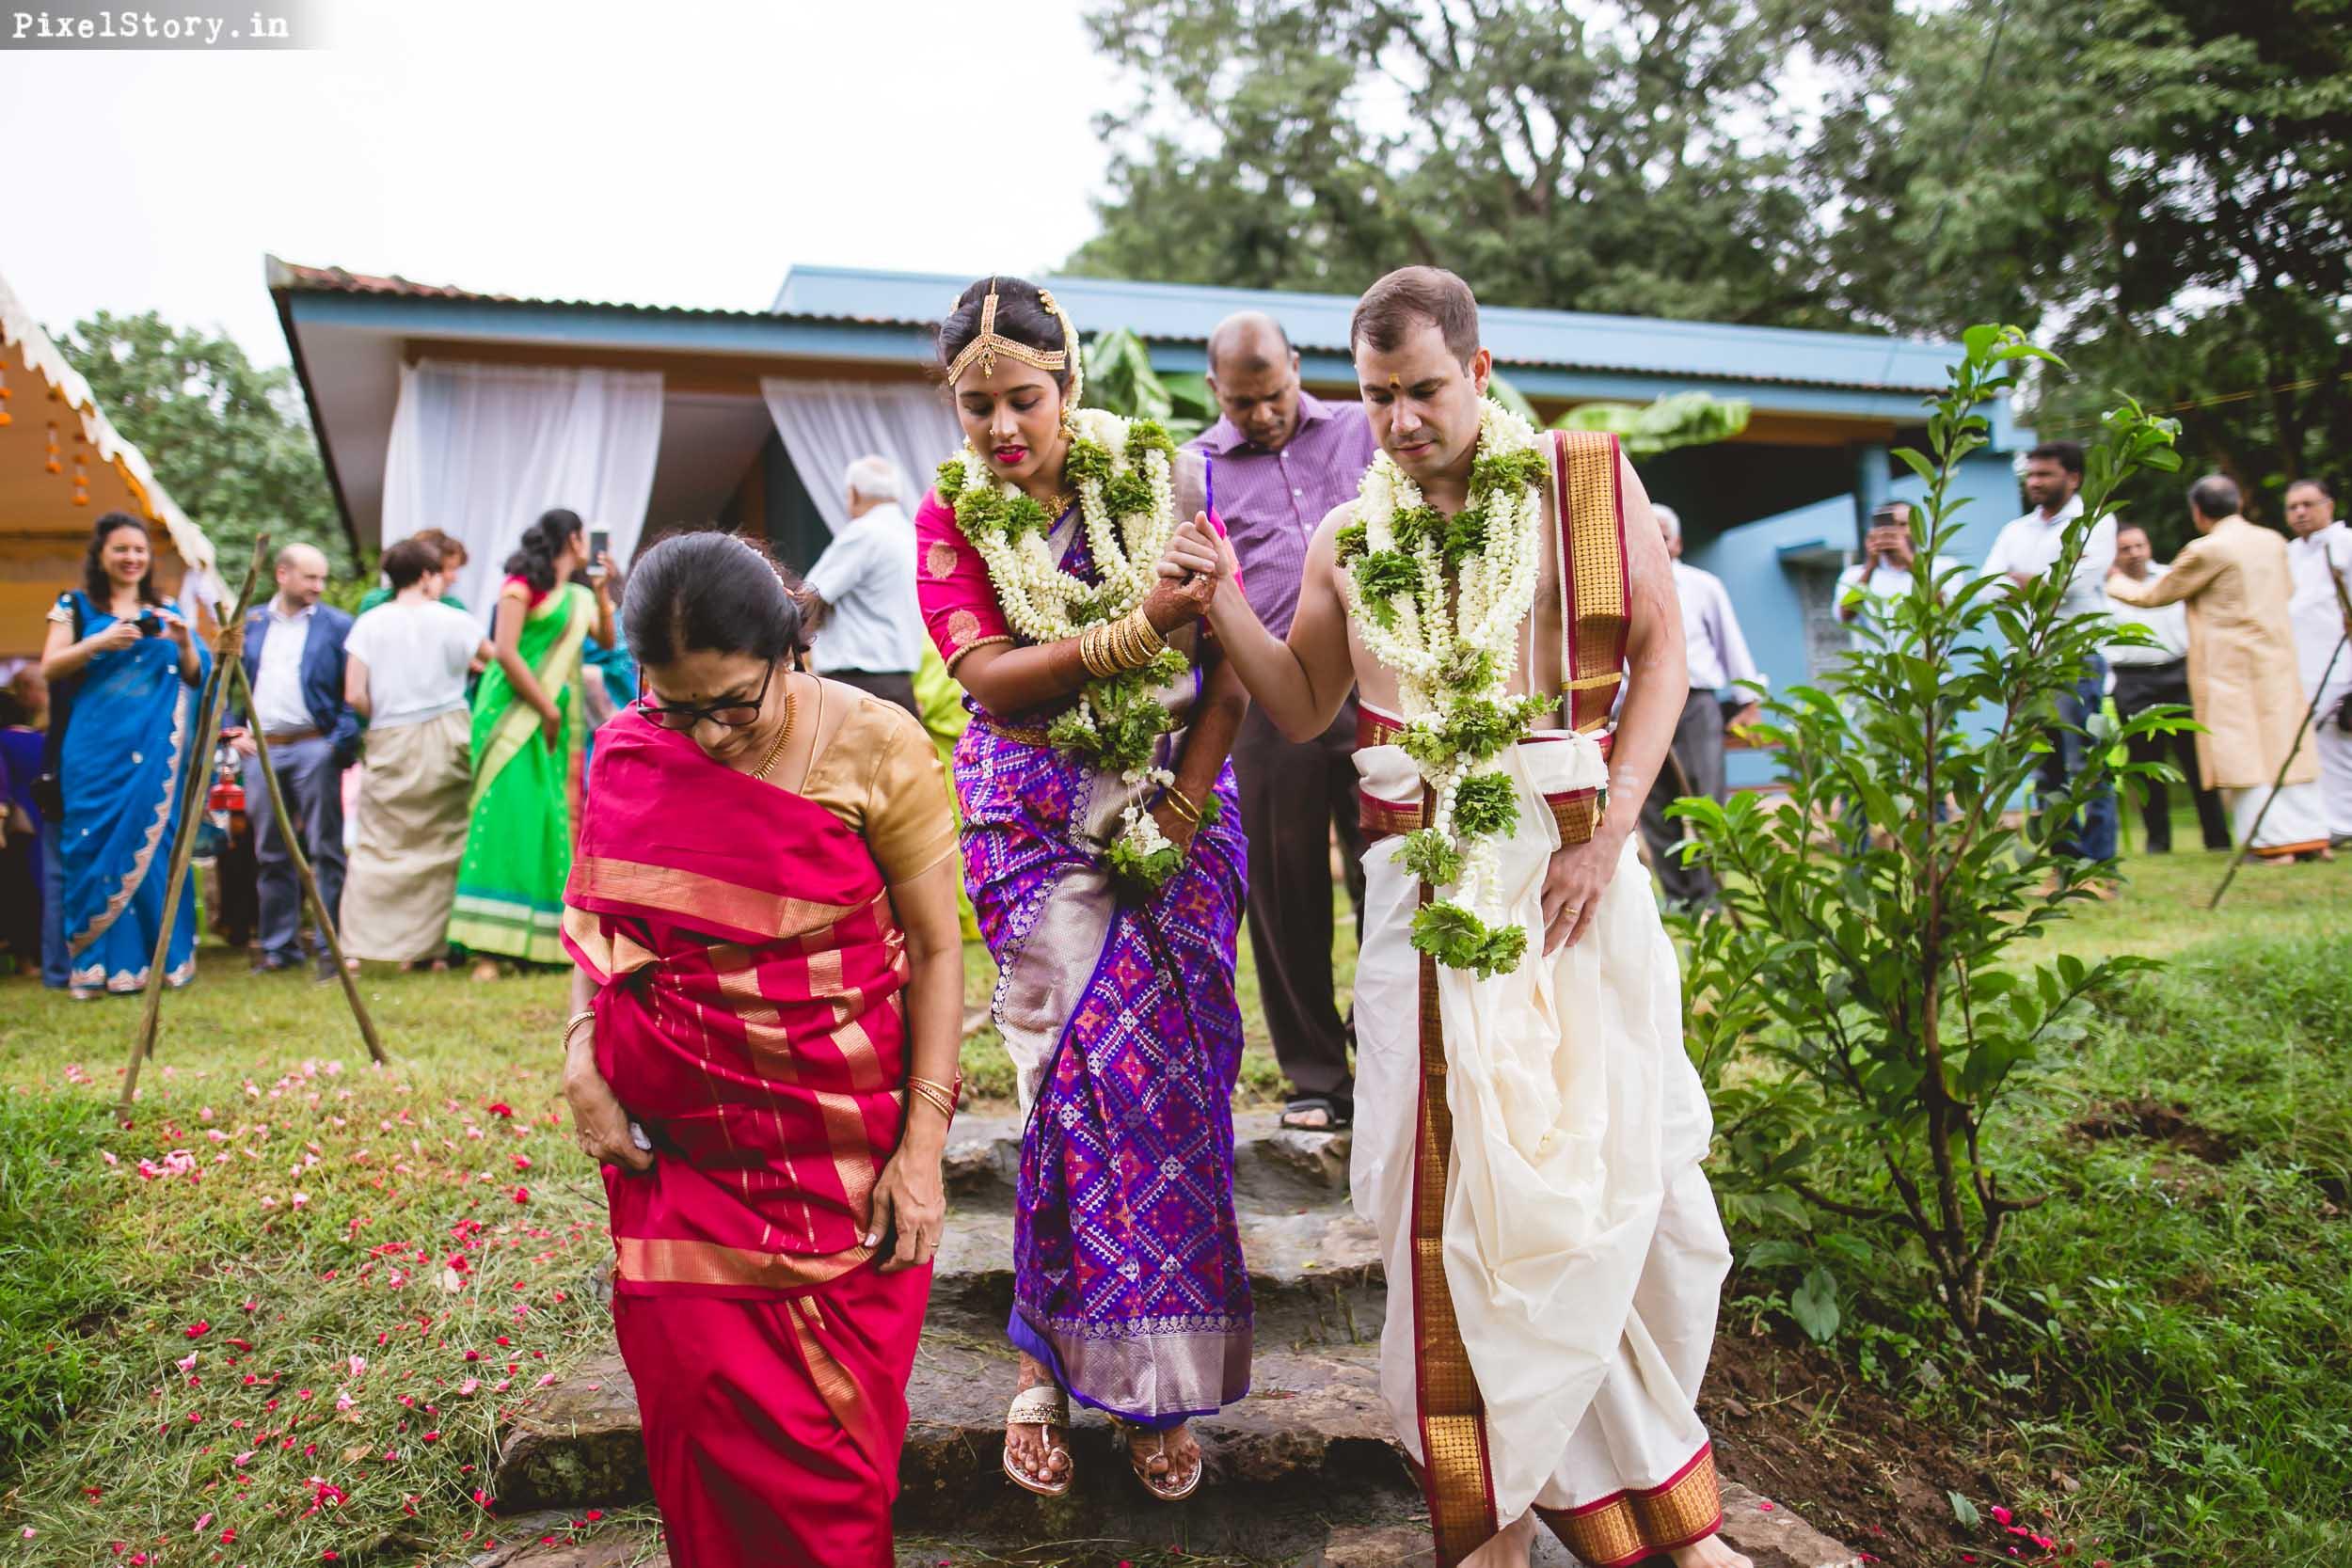 PixelStory-Jungle-Wedding-Photographer-Masinagudi-Indo-French047.jpg